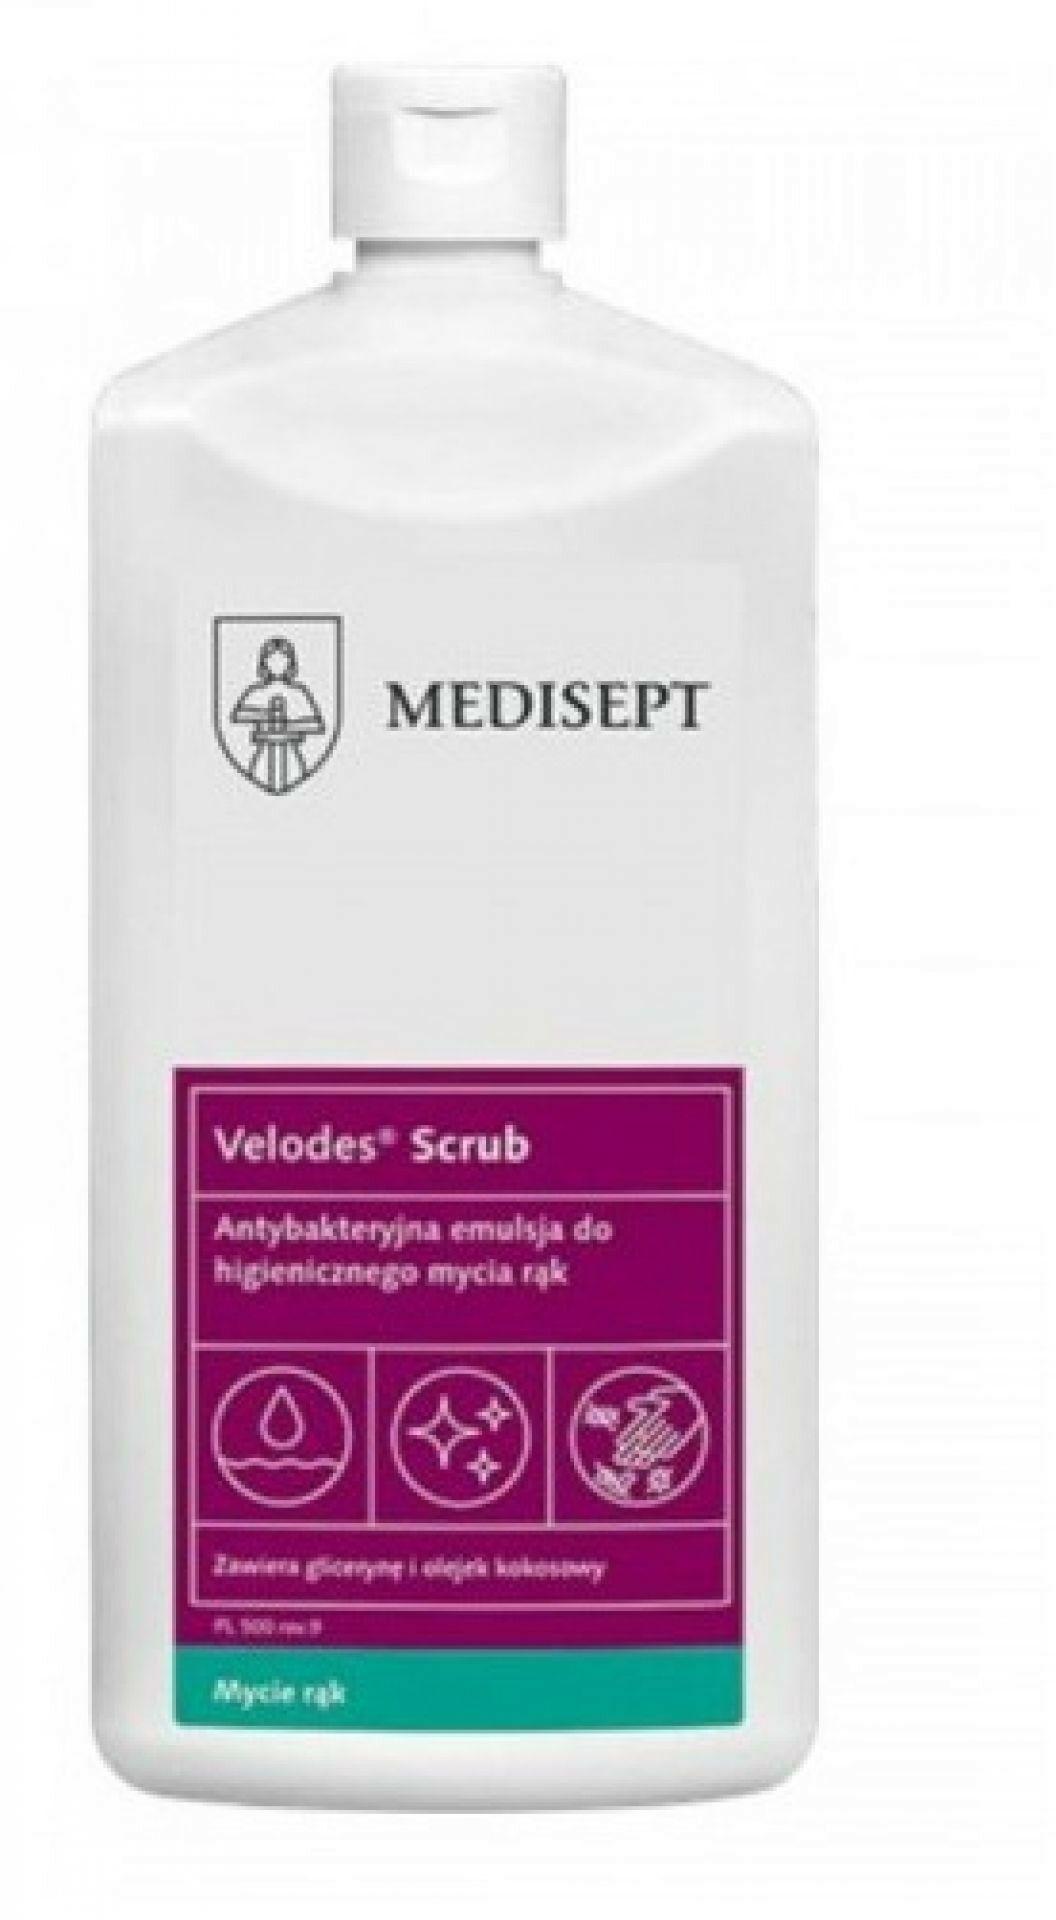 Velodes Scrub Medisept 500ml - emulsja